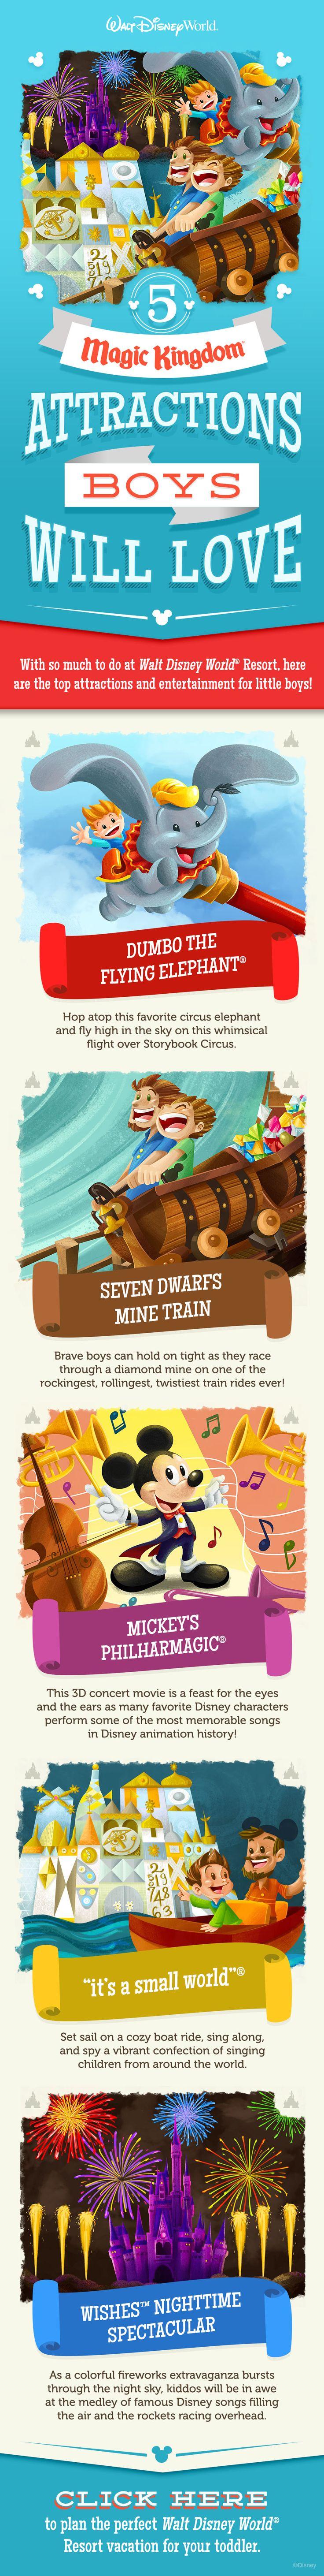 5 Magic Kingdom Attractions Boys will Love at Walt Disney World! #Vacation #DisneyKids #tips